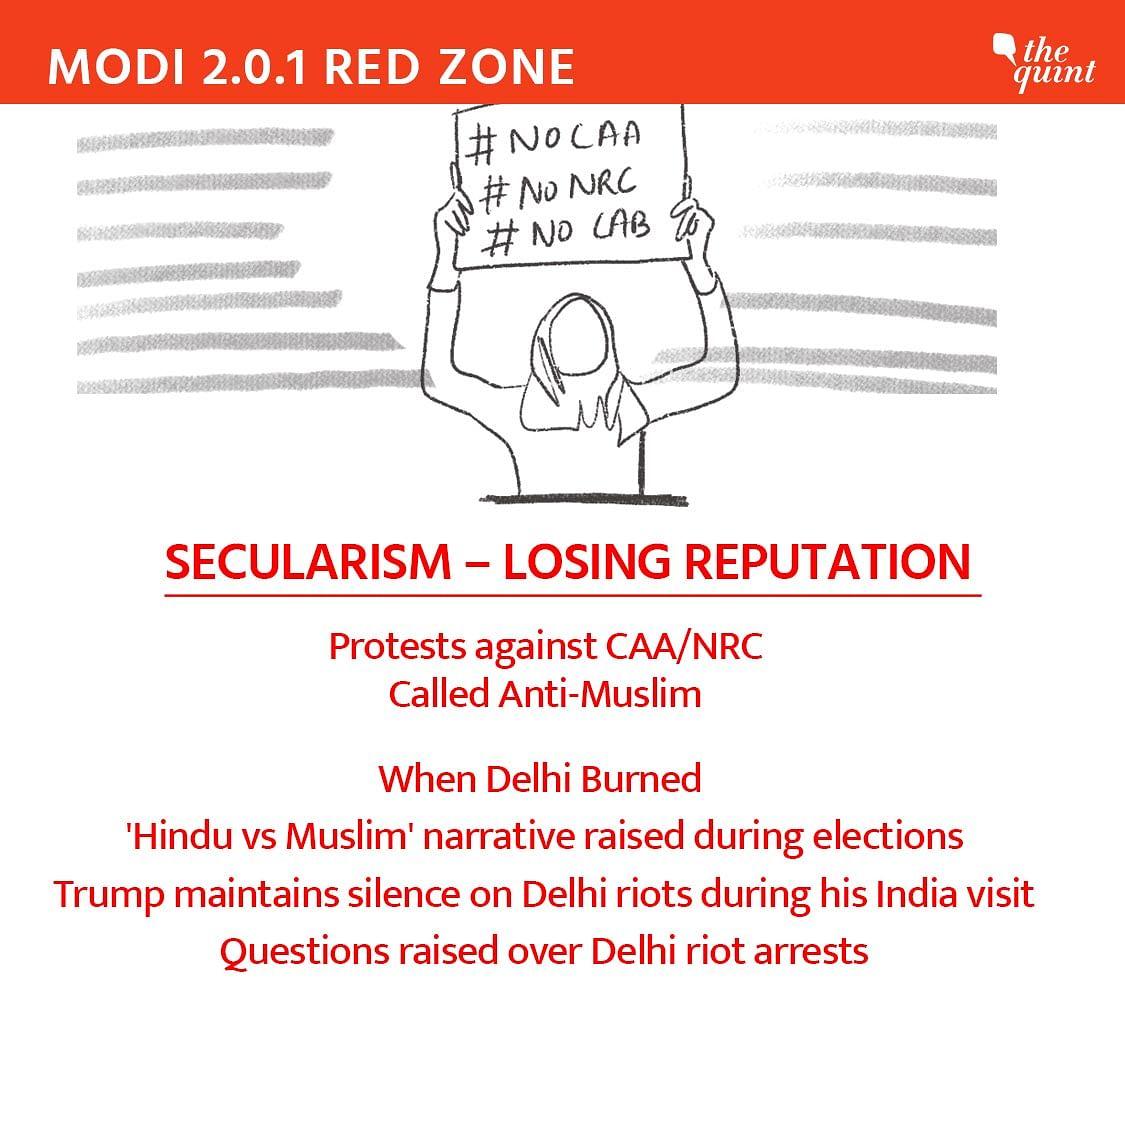 Secularism – Losing its reputation.